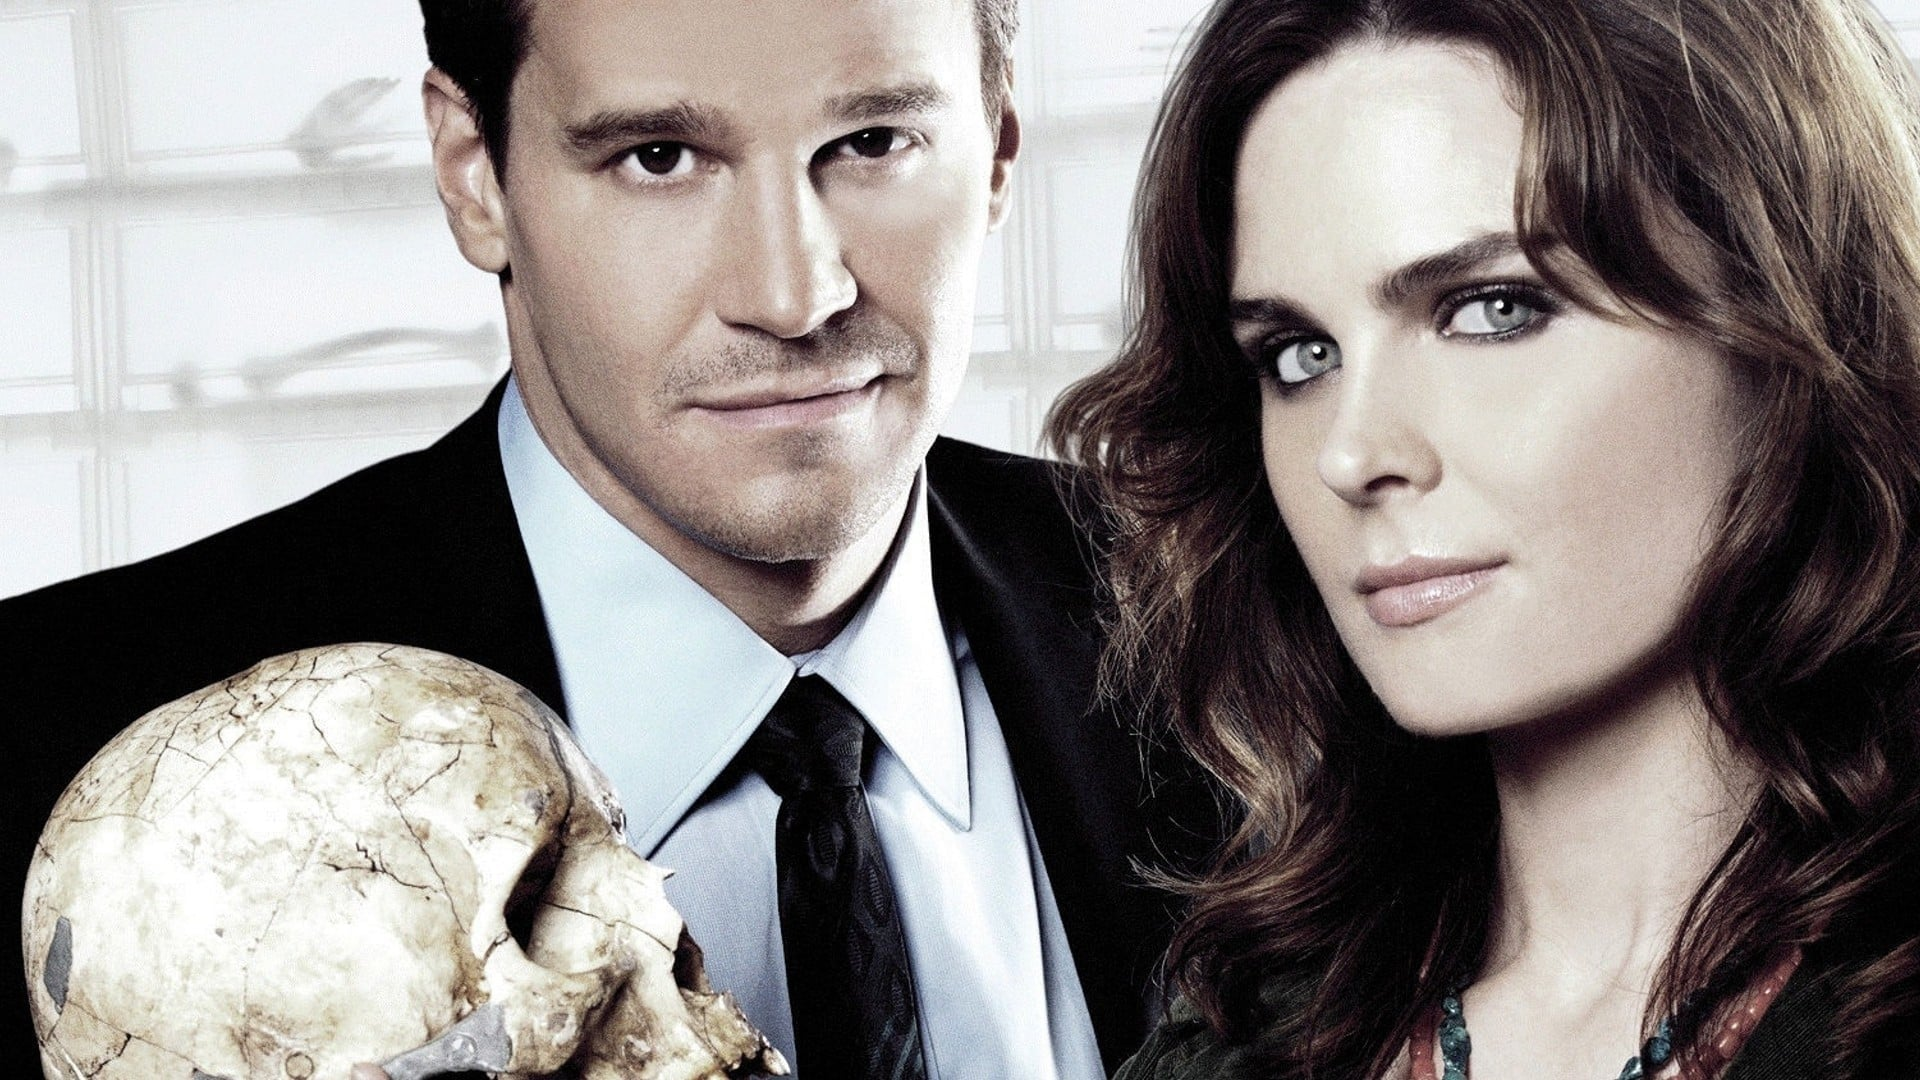 Bones - Season 12 - The Final Chapter